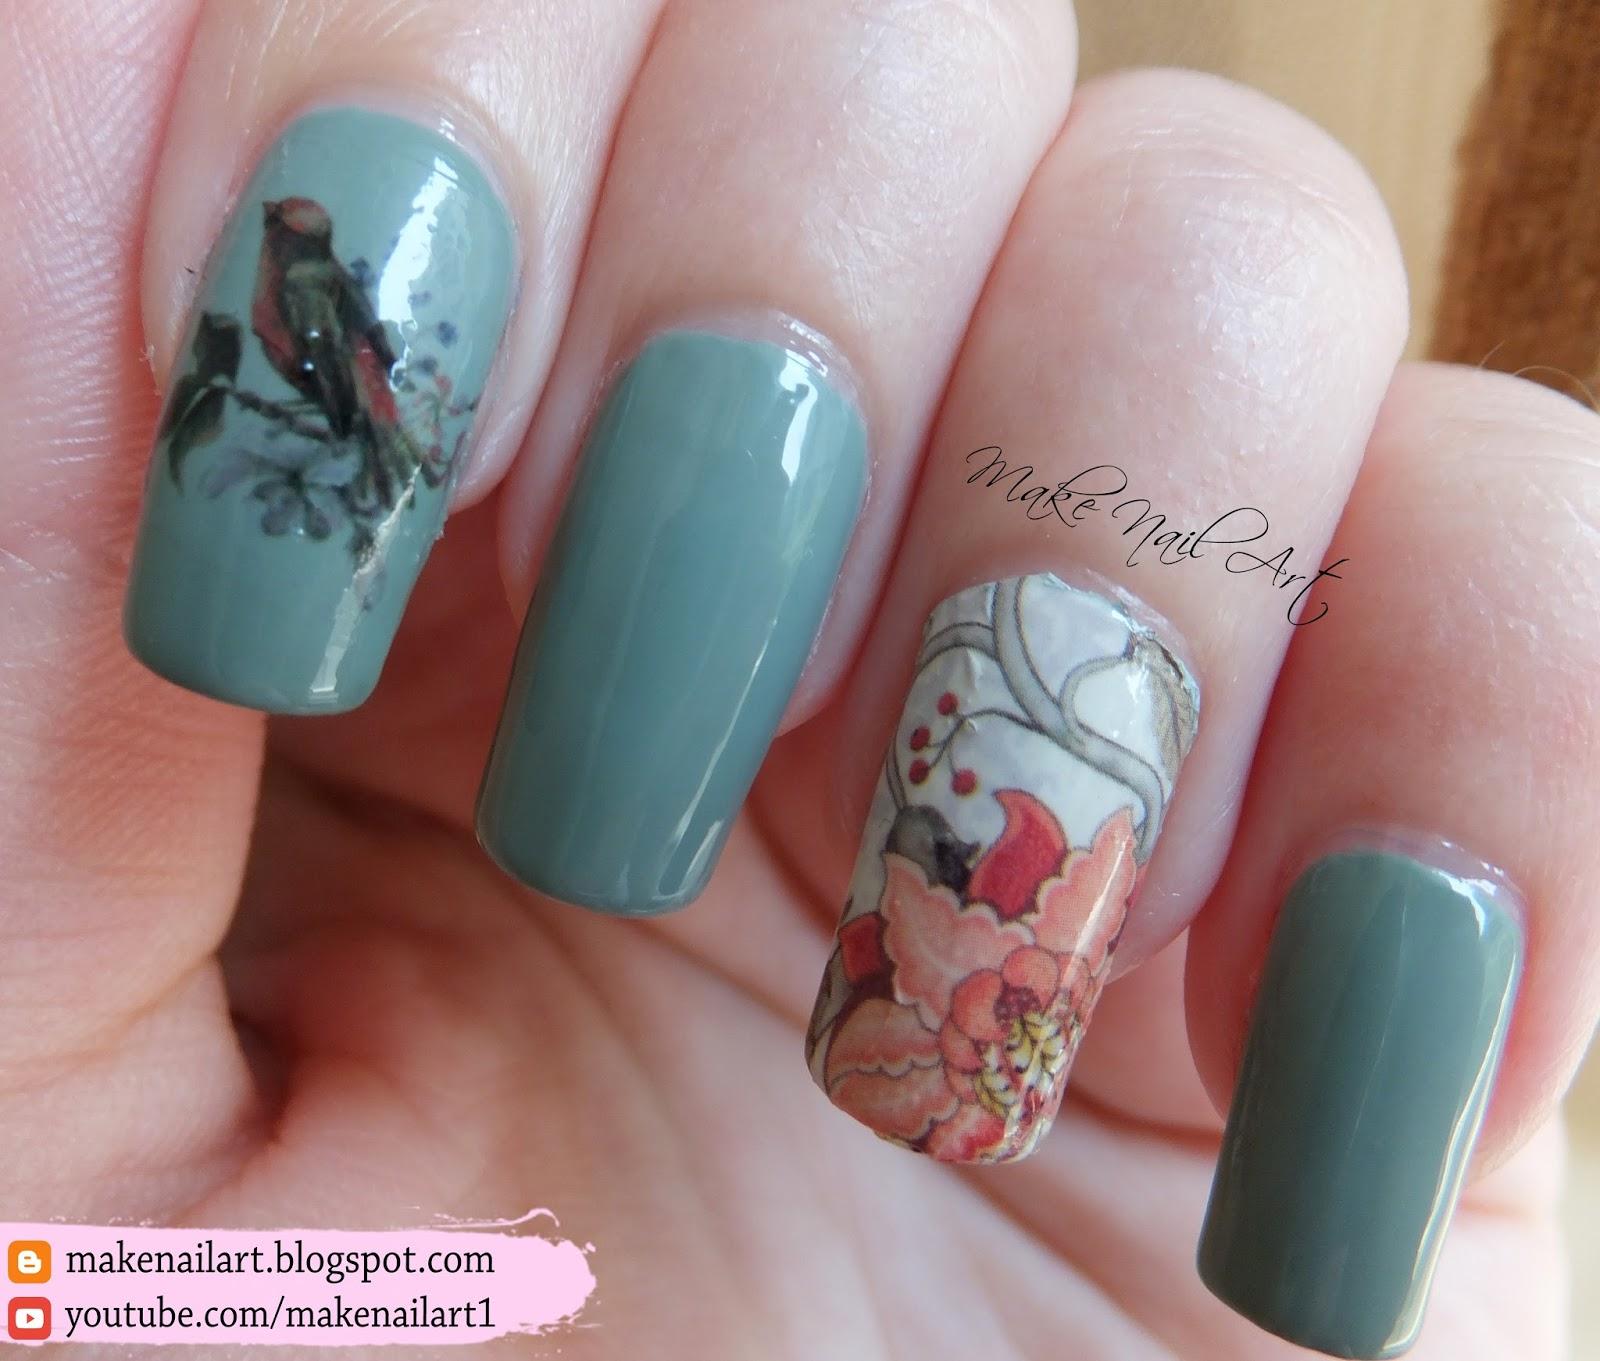 Make Nail Art: Vintage Flowers And Birds Nail Art Design - Nicole ...